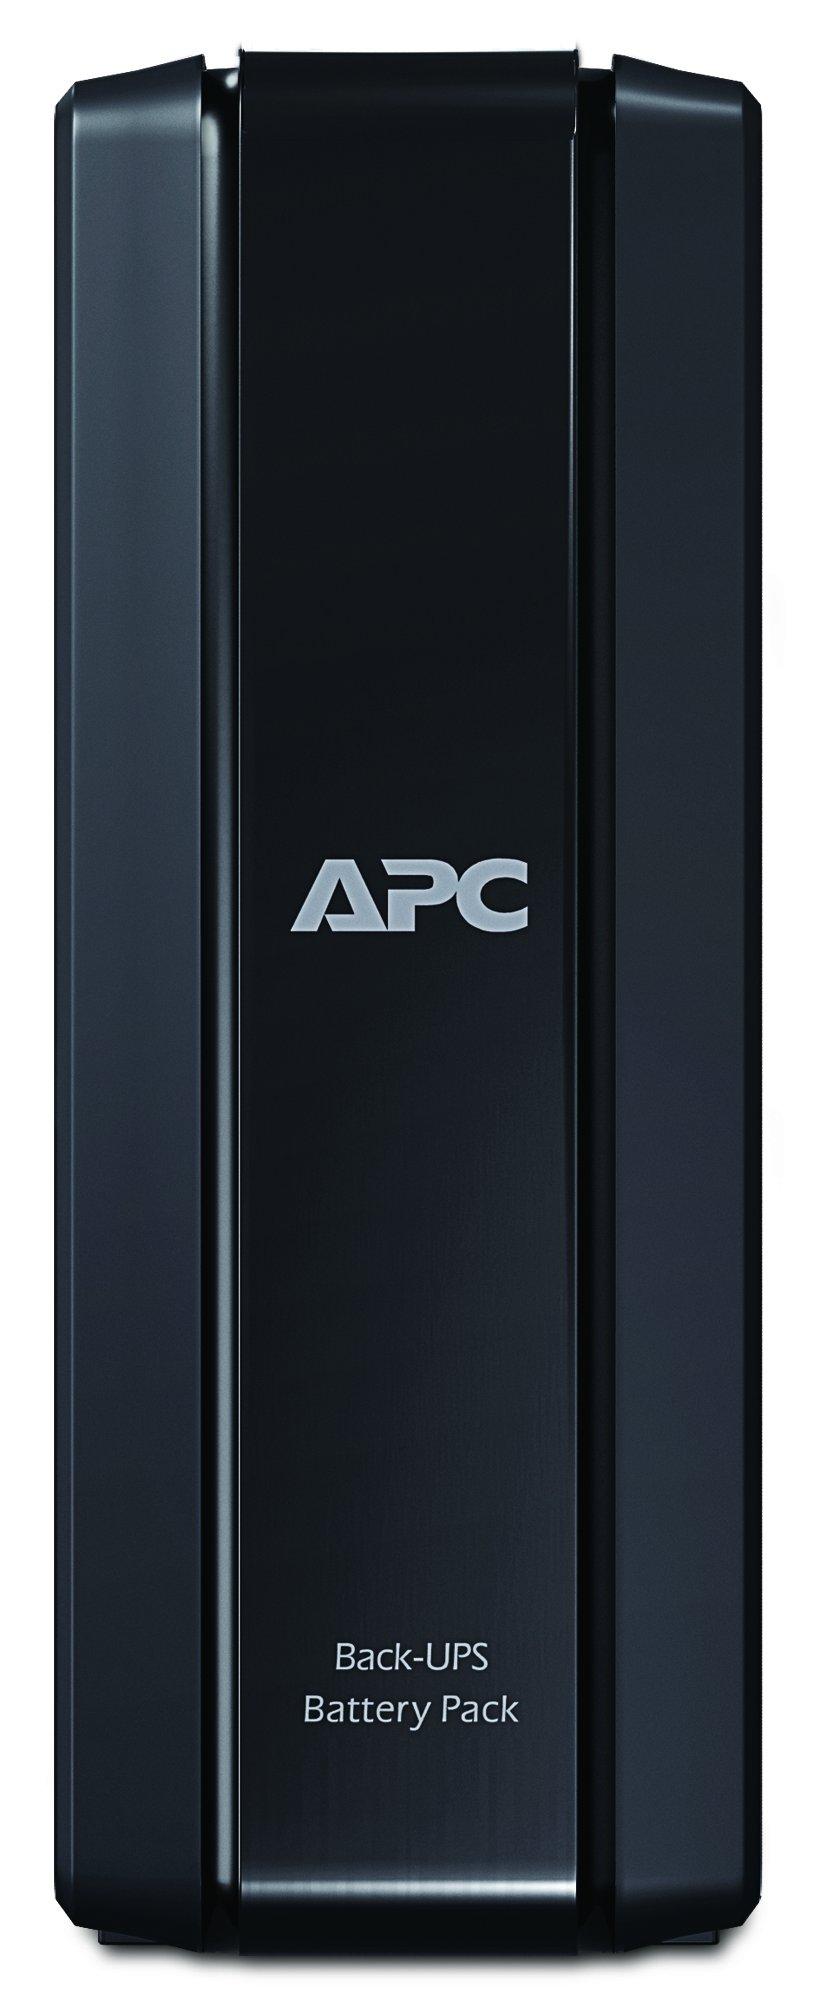 APC External Battery Backup Pack for Model BR1500G (BR24BPG) by APC (Image #3)